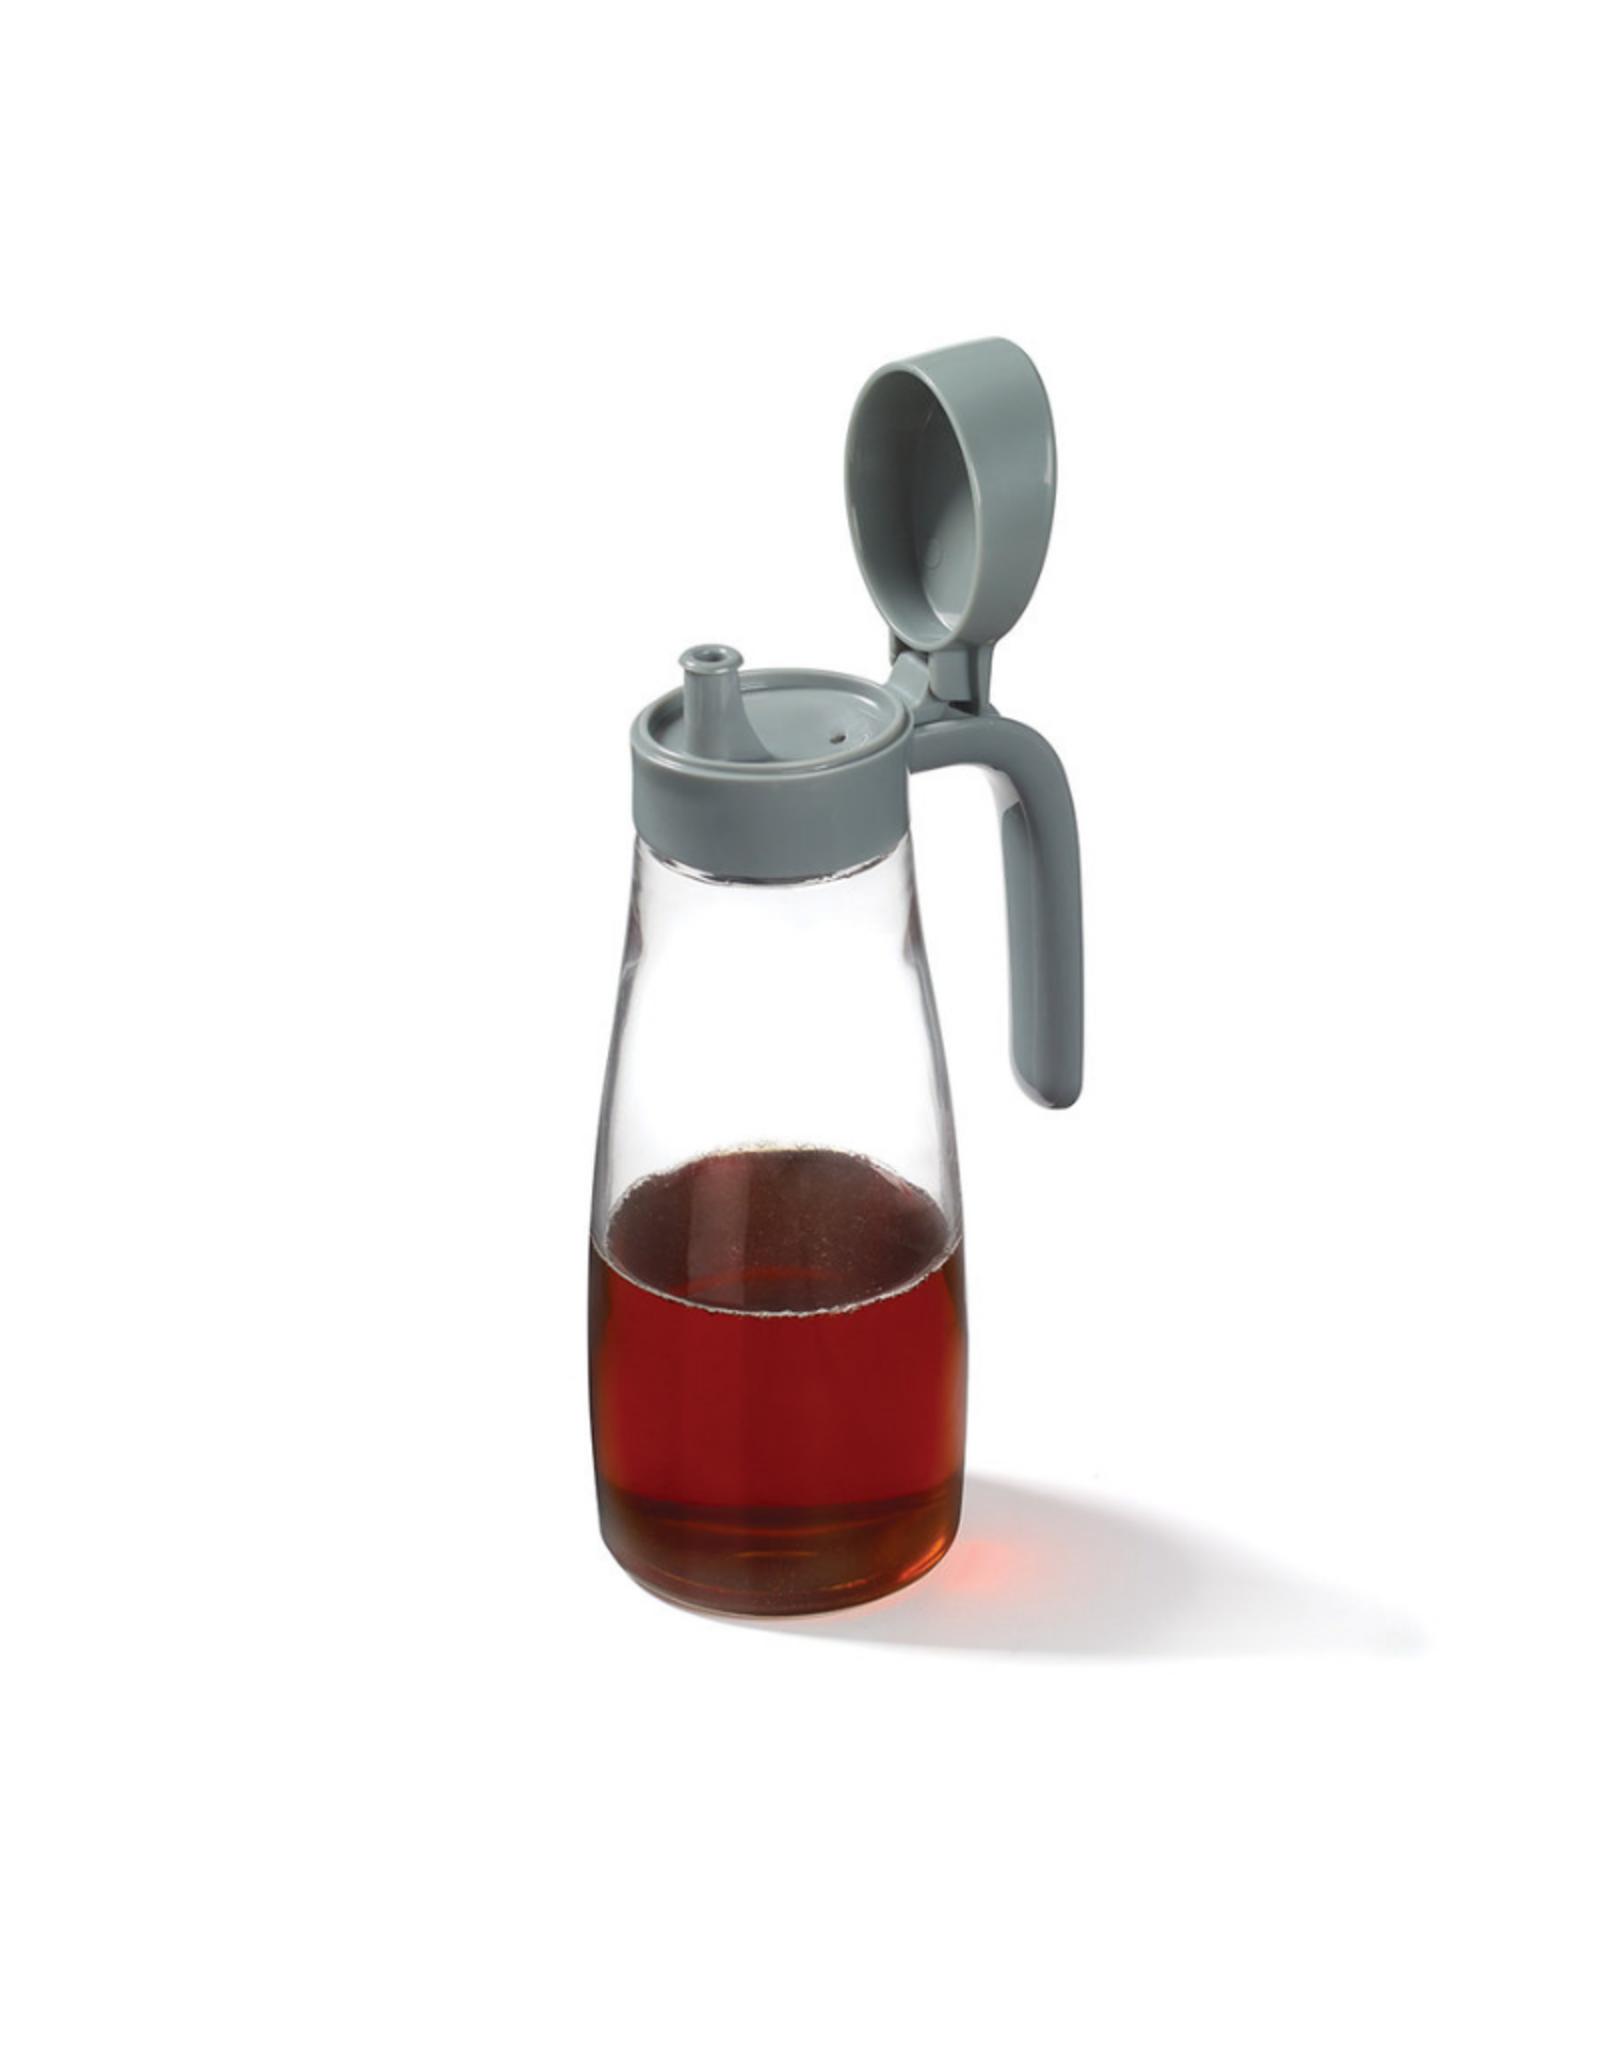 Ricardo Bouteille pour huile et sirop 600ml